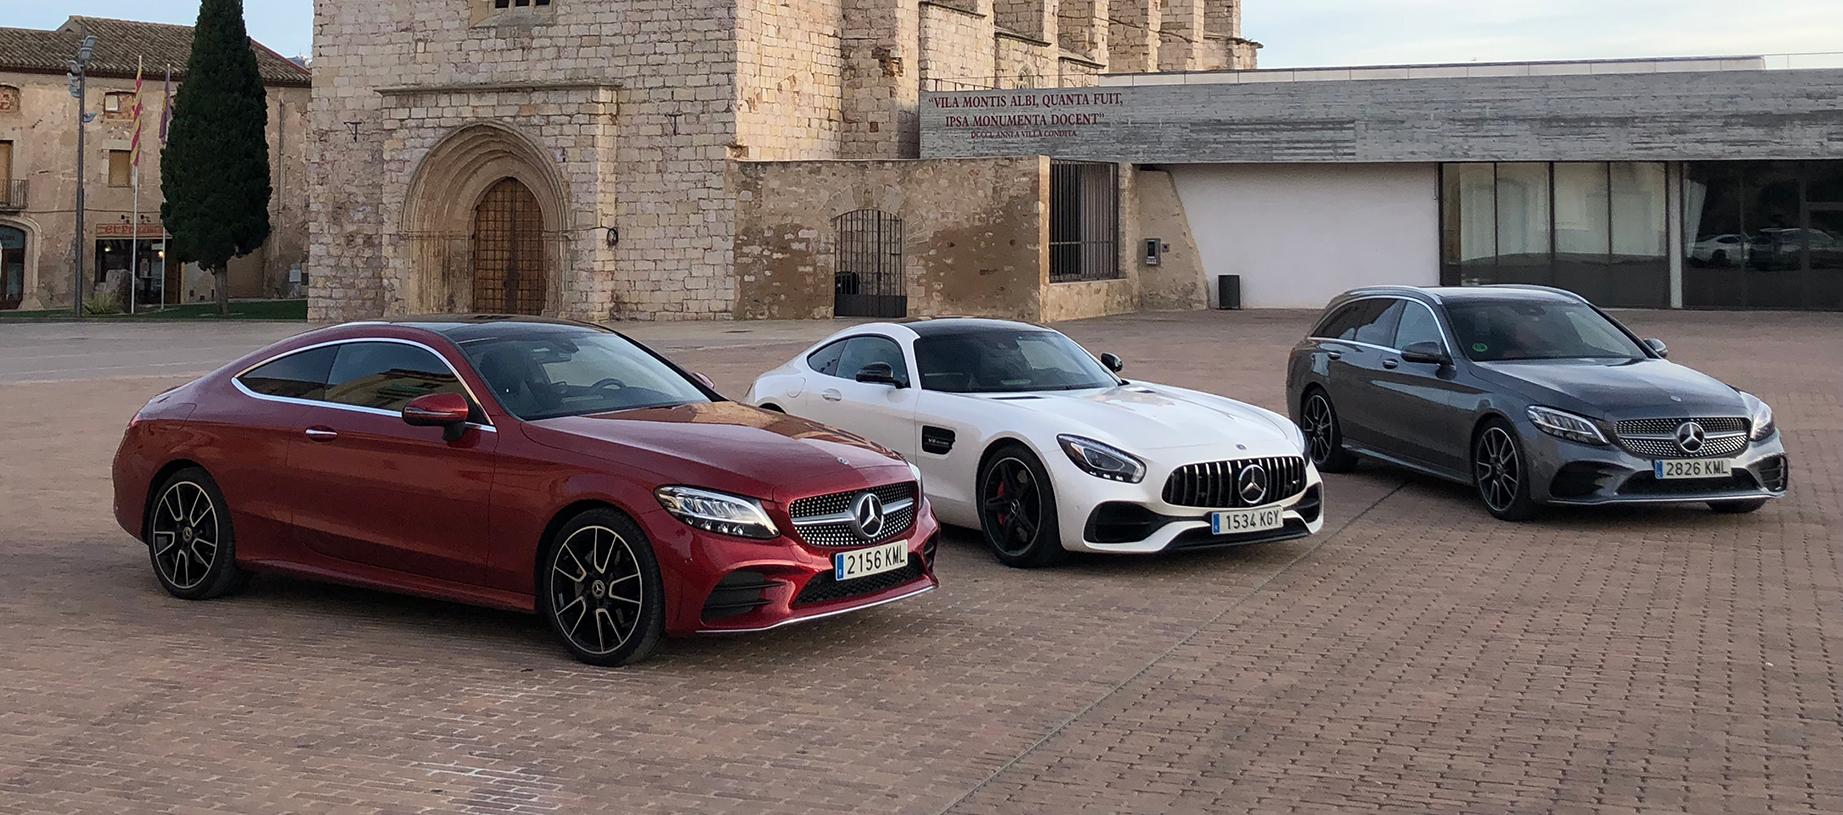 Test Days de Mercedes-Benz. Las novedades de 2018 a prueba